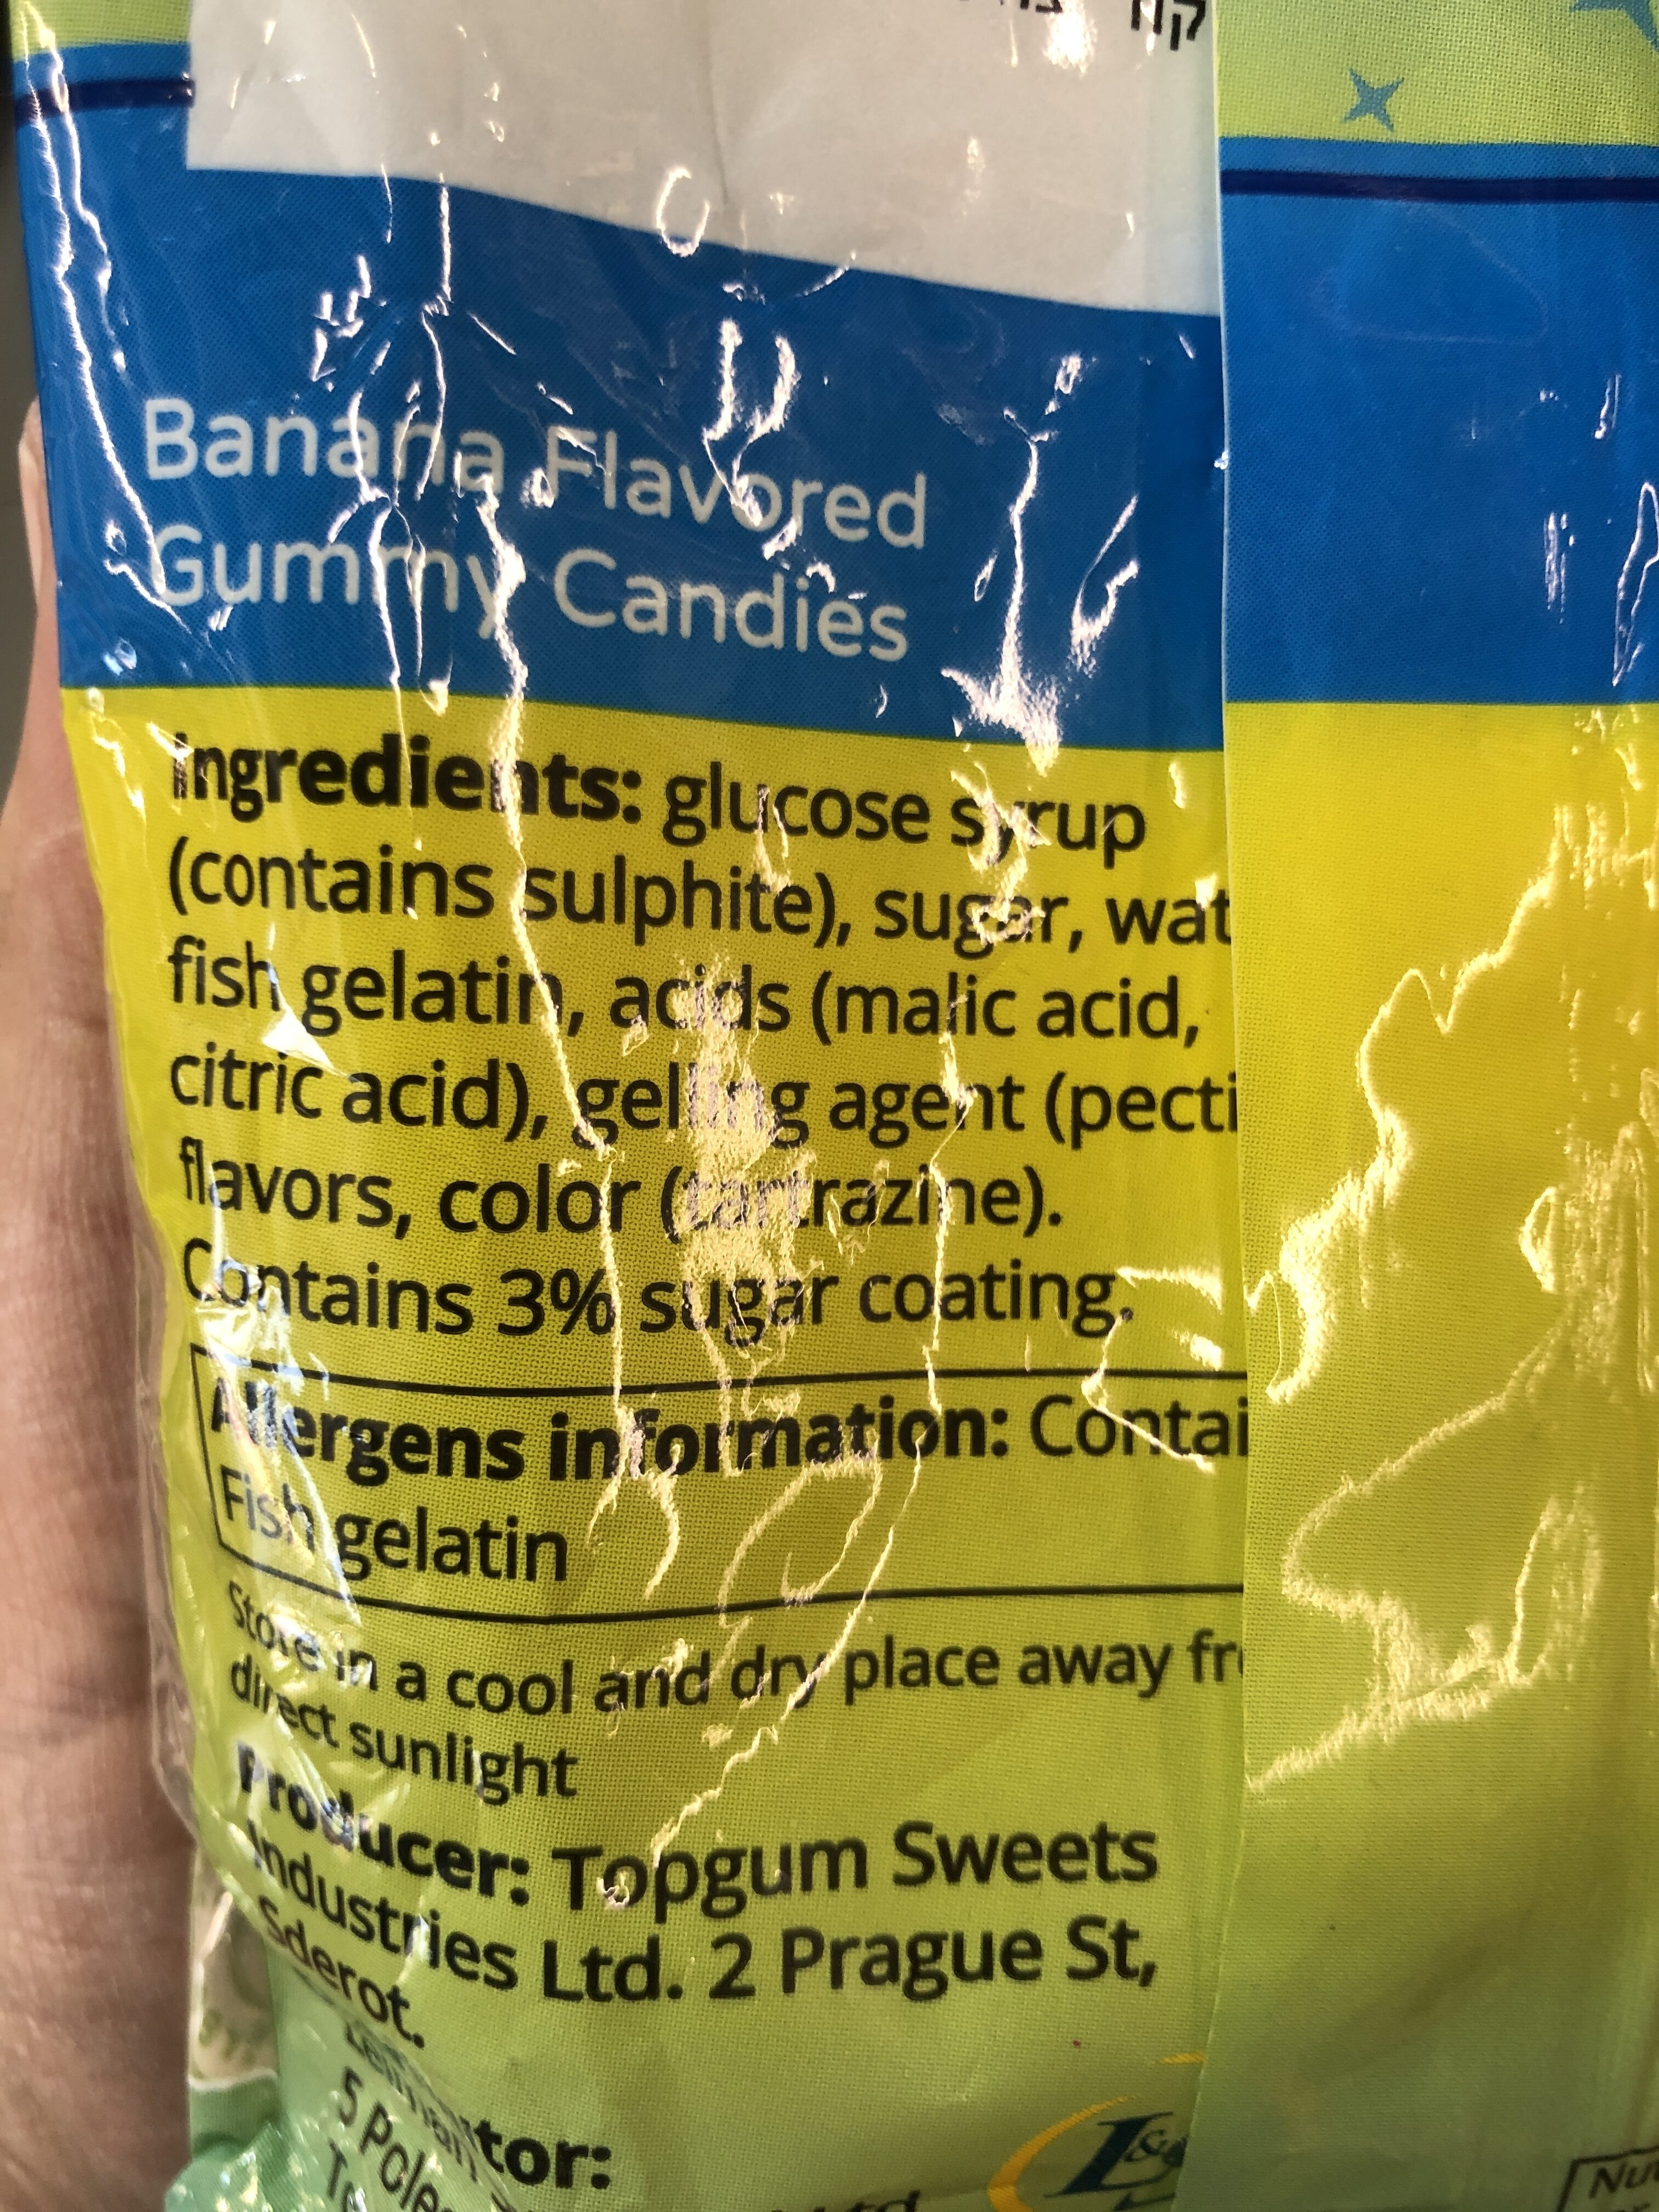 Banana Flavored Gummy Candies - Ingredients - en